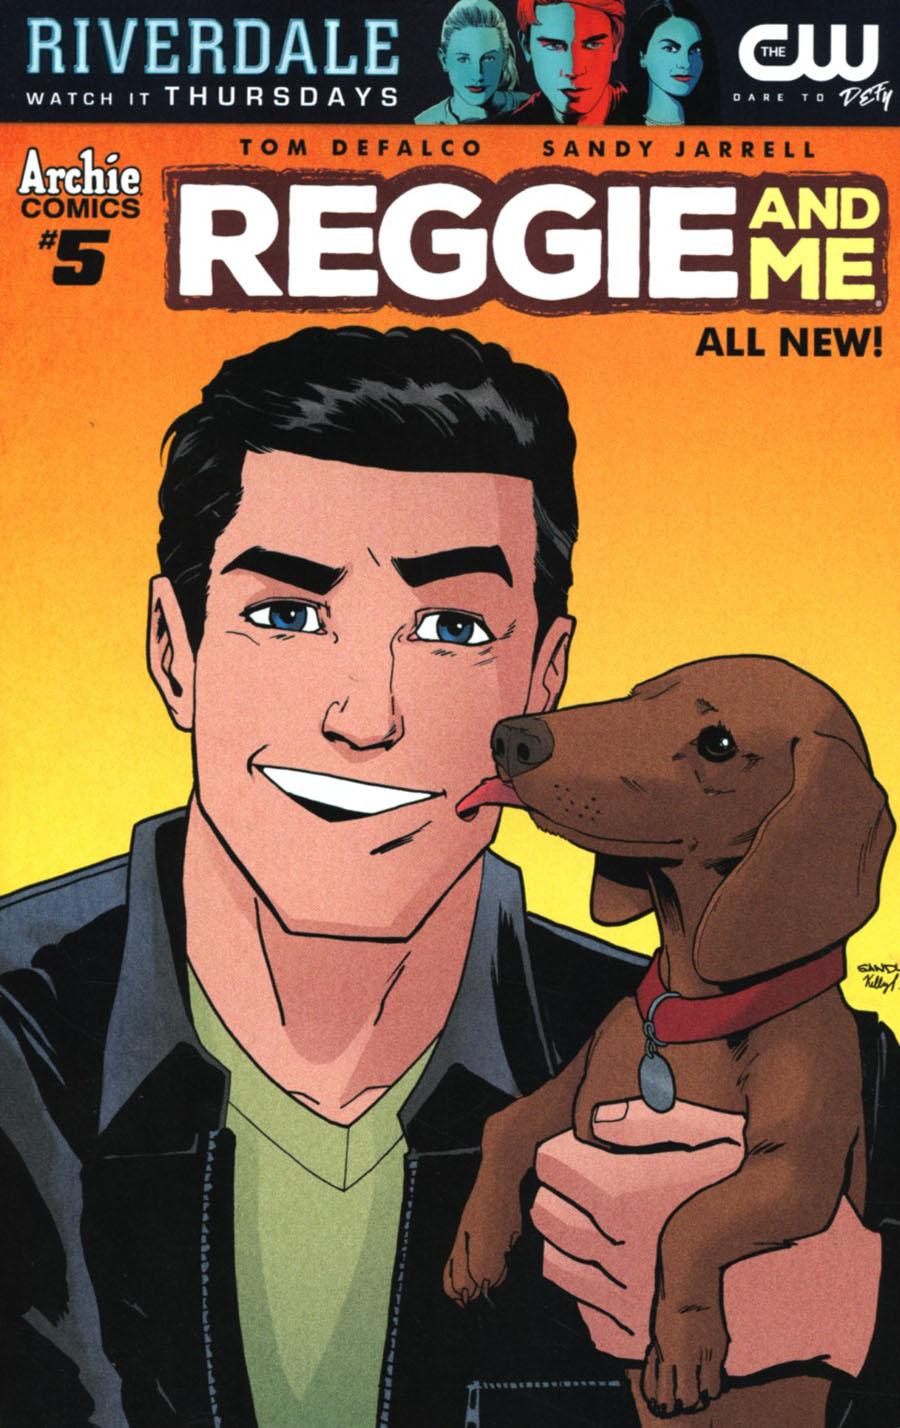 Reggie And Me Vol 2 #5 Cover A Regular Sandy Jarrell Cover